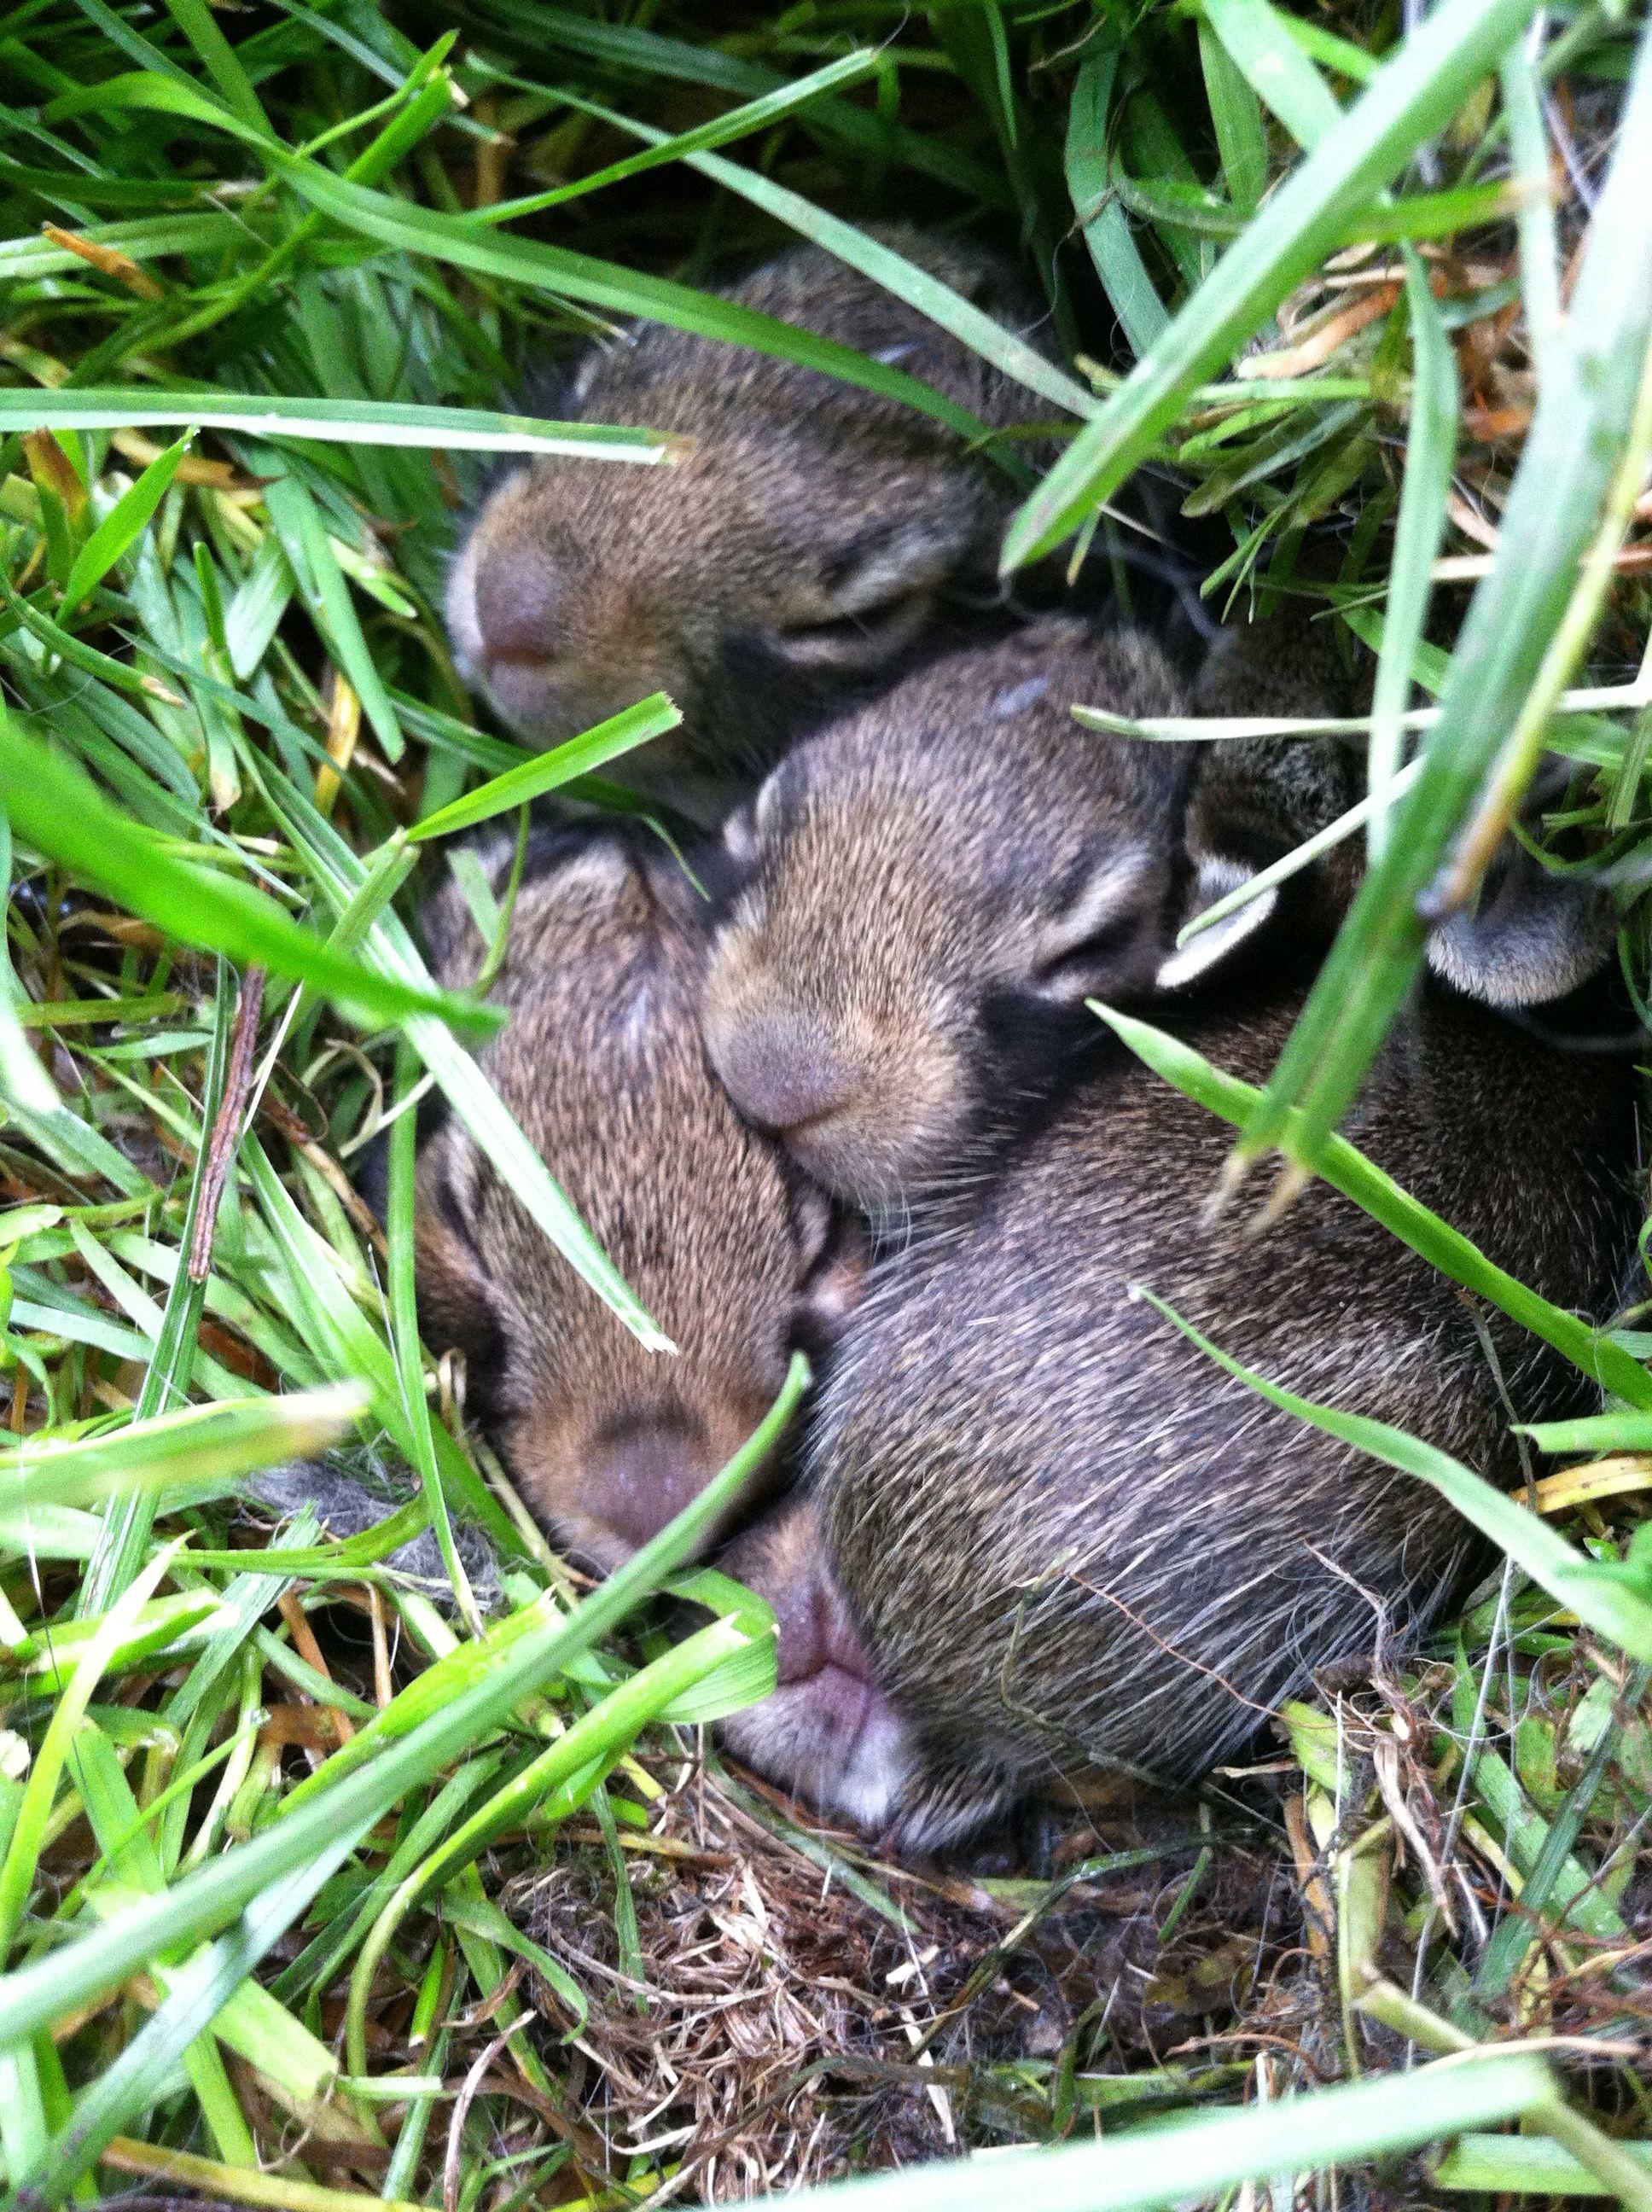 Baby bunnies born in my sisters backyard baby bunnies